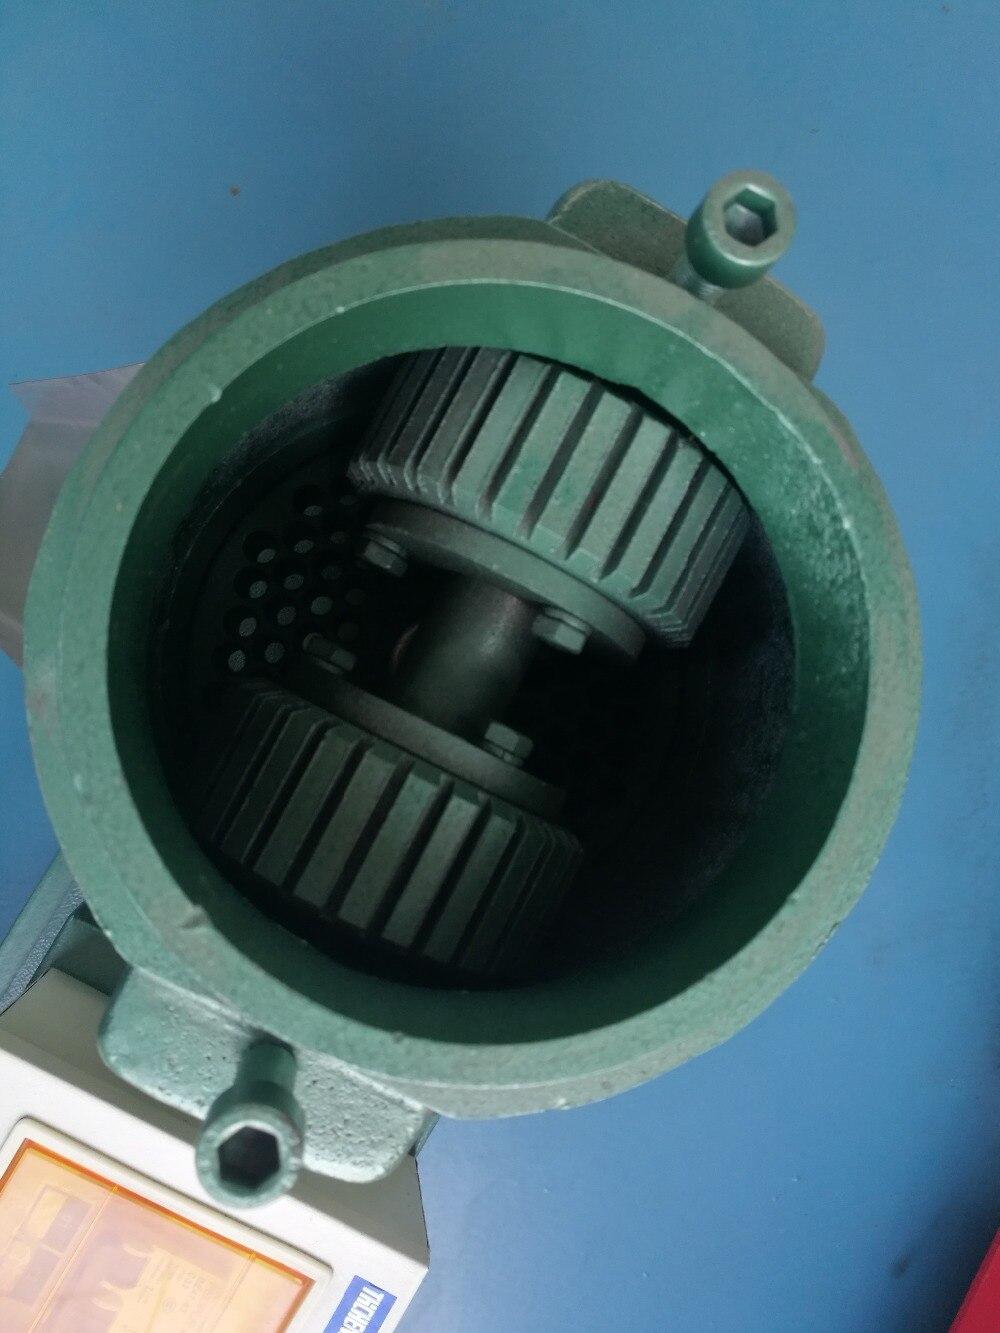 5 Mm And 8 Mm Diameter Die Mould Matrix Of KL120 Pellet Pressing Mill